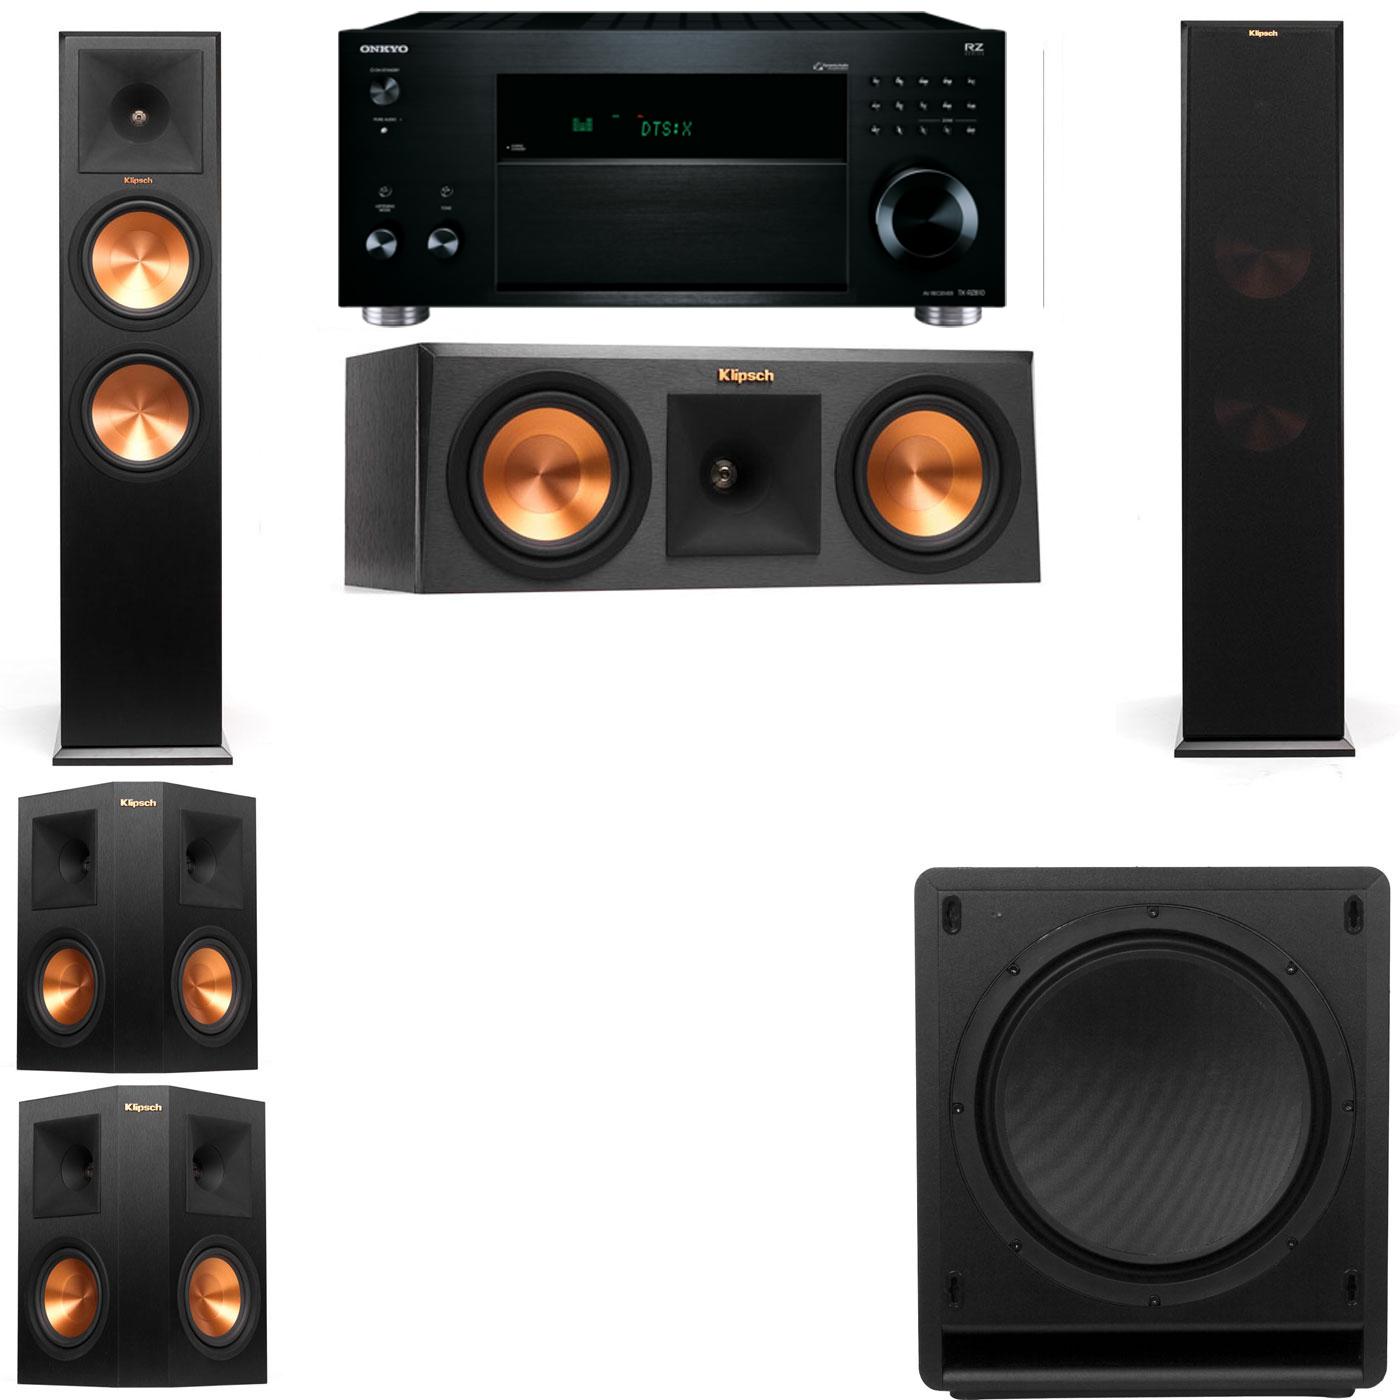 Klipsch RP-280F Tower Speakers-RP-250C-SW-112-5.1-Onkyo TX-RZ810